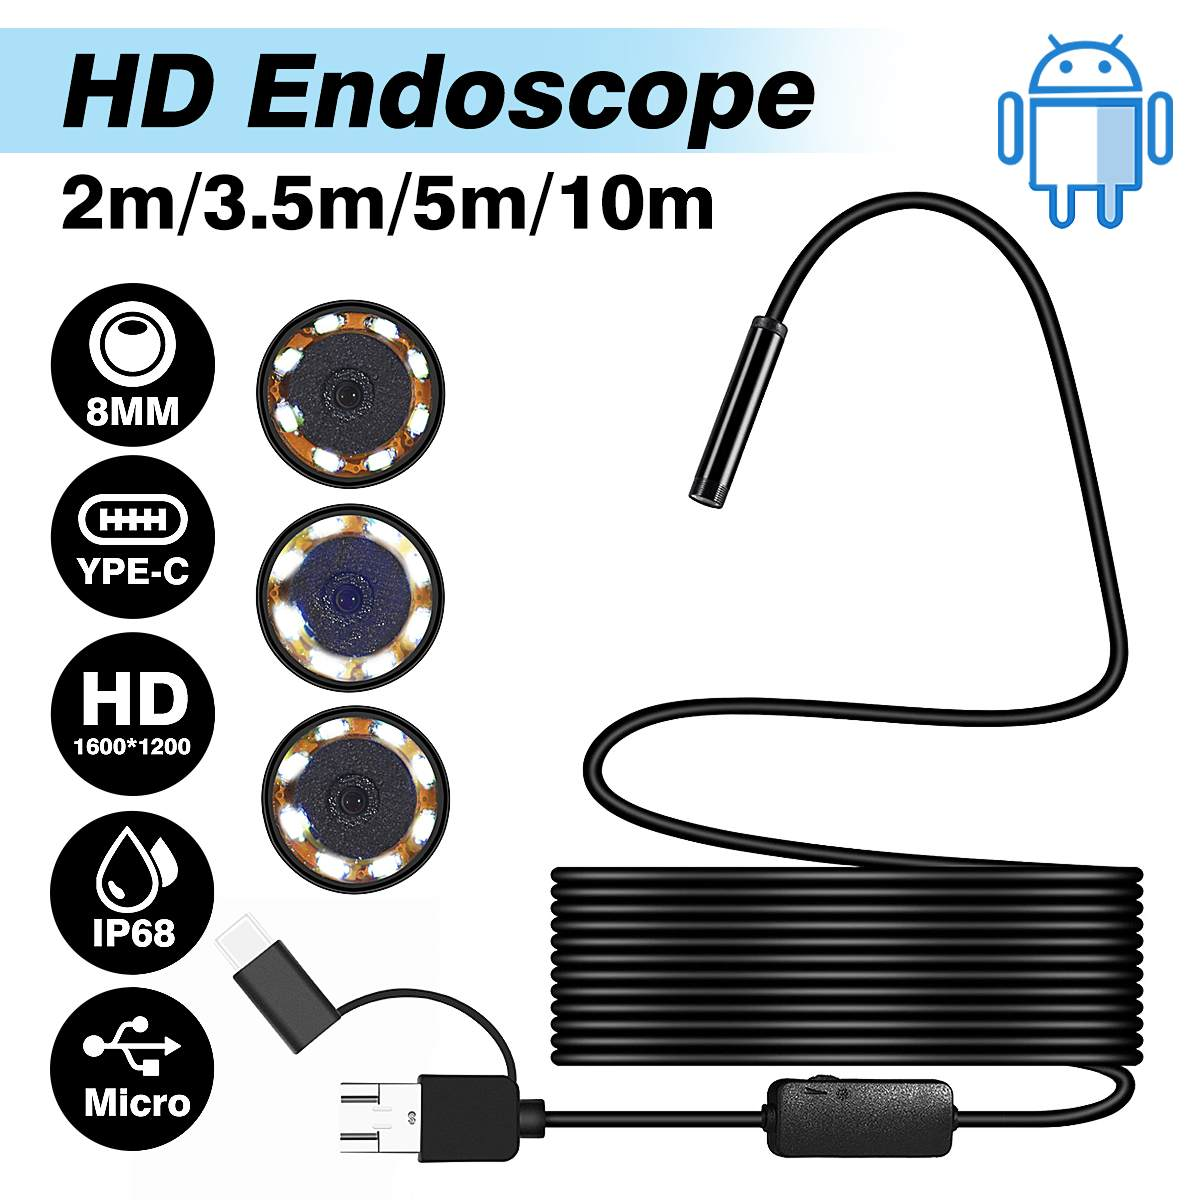 8mm lente 2M 3,5 M 5M 10M HD 1200P CÁMARA DE endoscopio USB para Android Flexible serpiente USB de inspección de Android Teléfono Cámara boroscopio